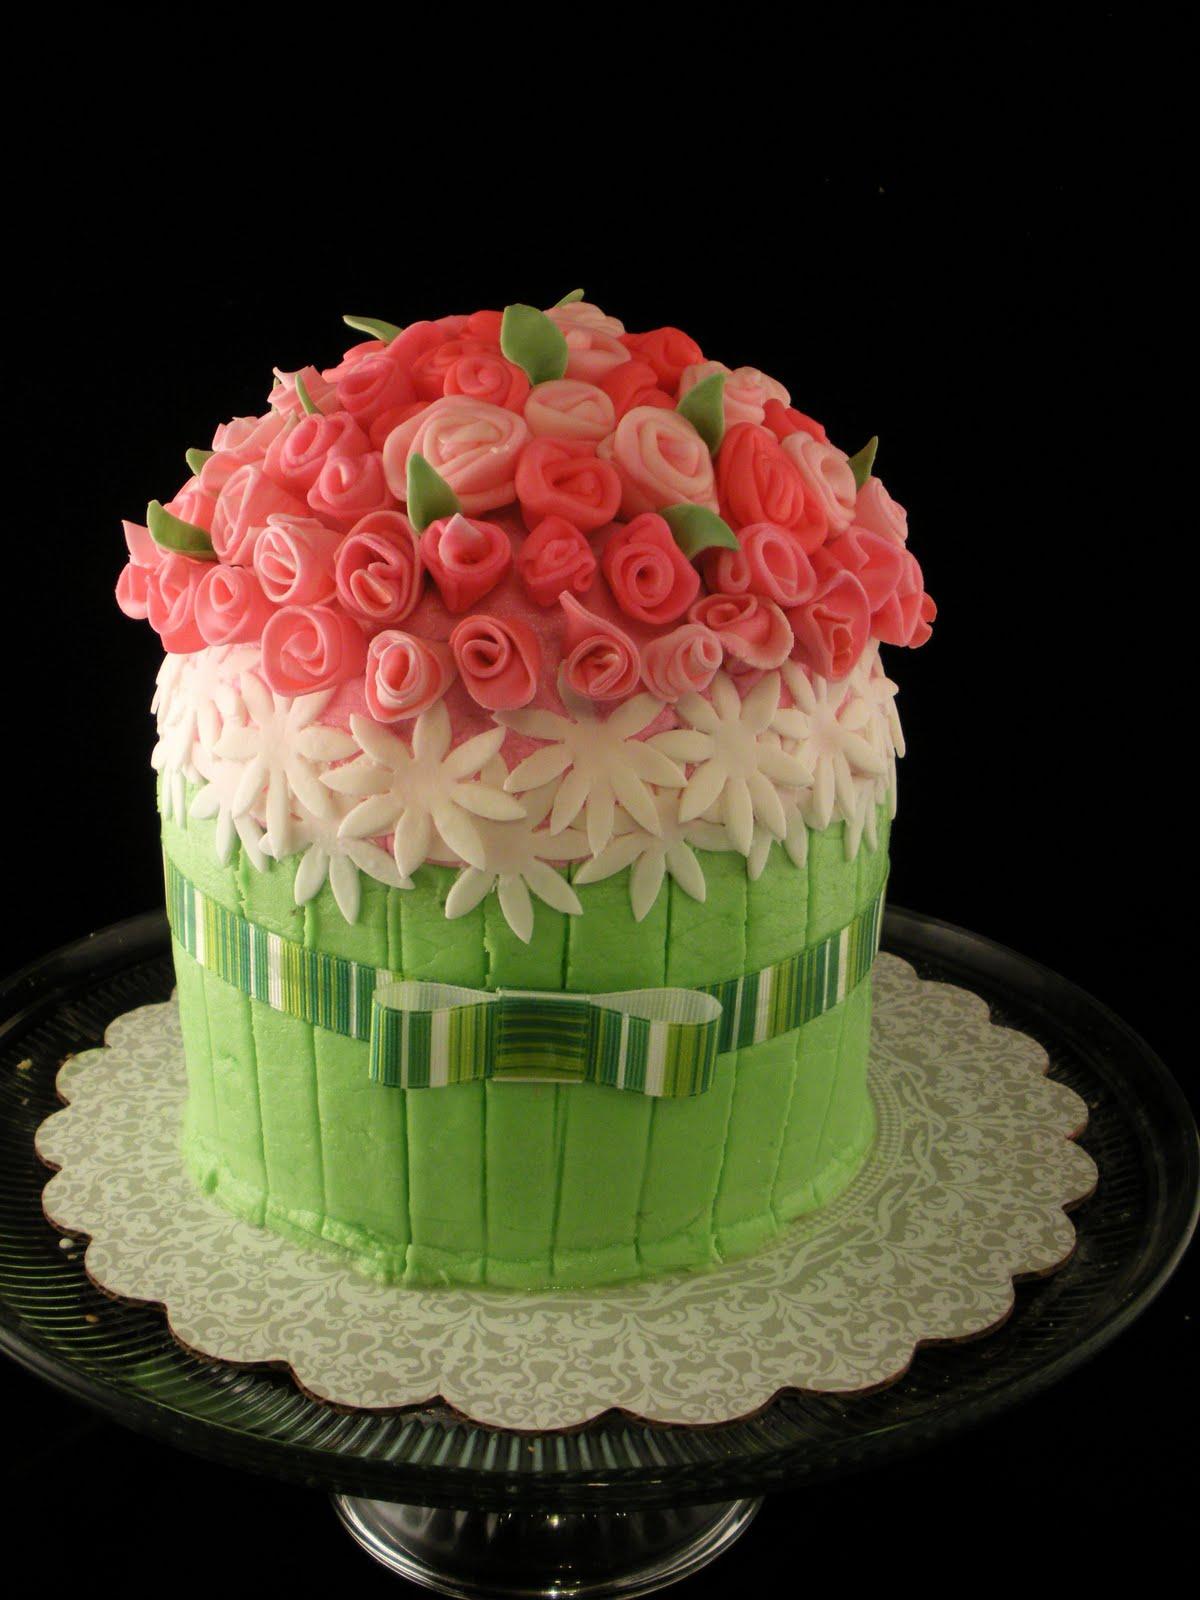 Dorable Bouquet Of Flowers Cake Motif Top Wedding Gowns